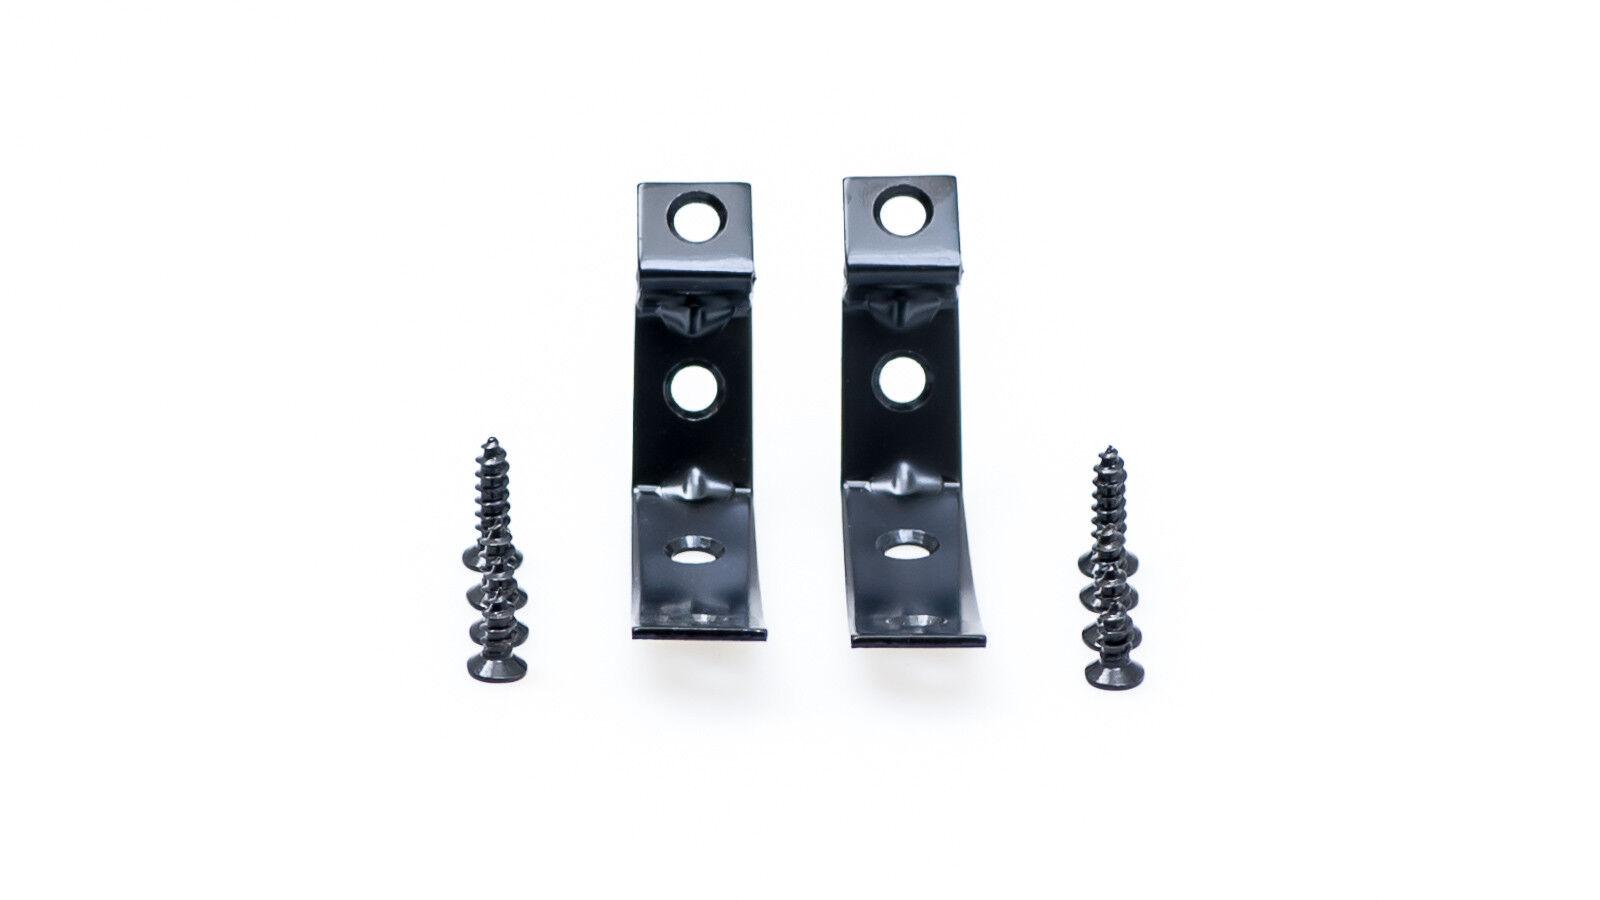 handschuhfach reparatur kit deckel repair f r audi a4 s4 rs4 b6 b7 8e klappe set eur 9 90. Black Bedroom Furniture Sets. Home Design Ideas